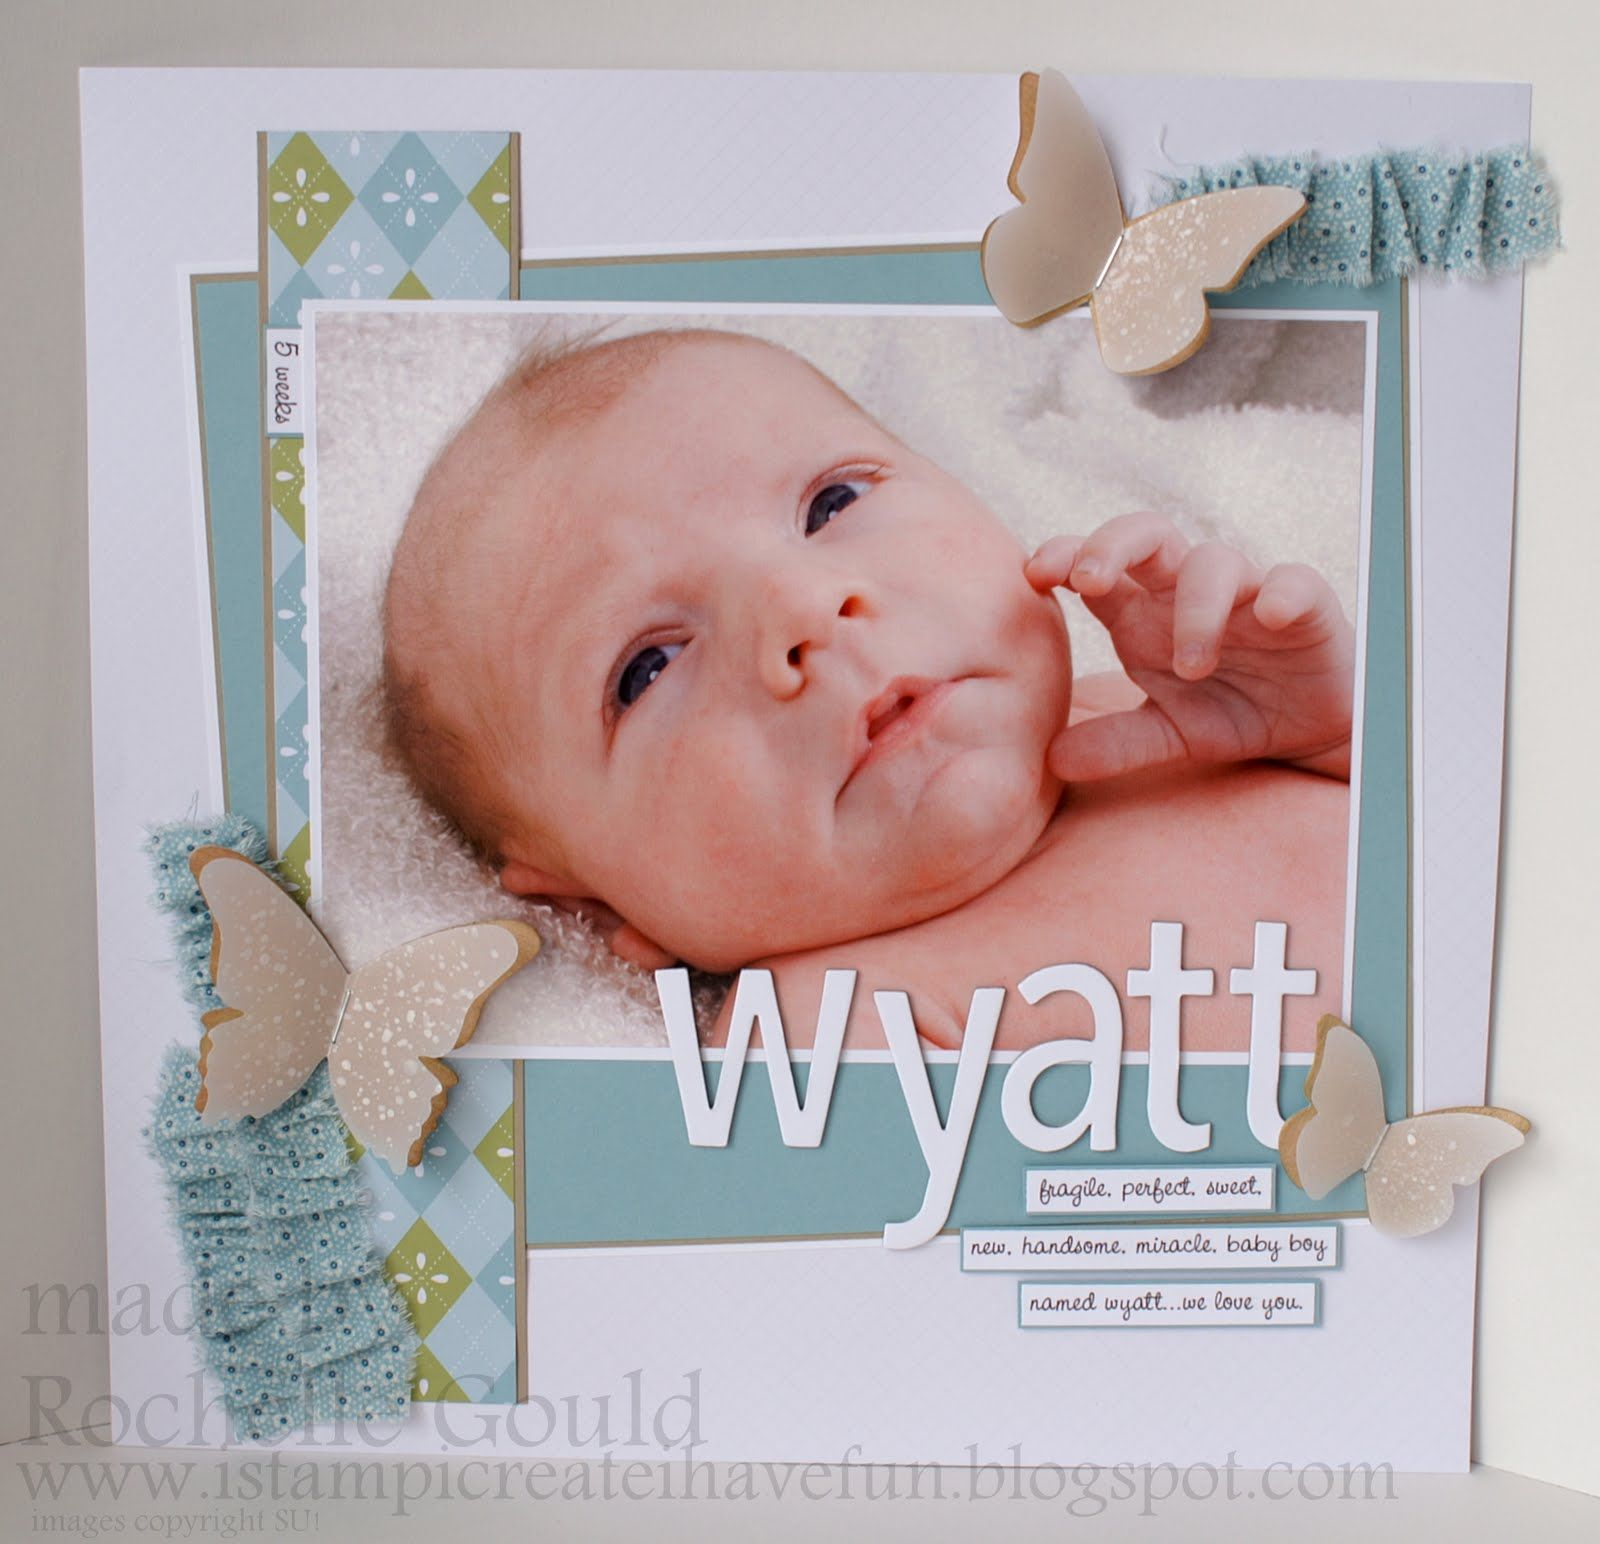 Baby+Boy+Scrapbook+Ideas | ... create, I have fun!: Non-Winning Artisan Award- Baby Wyatt Page